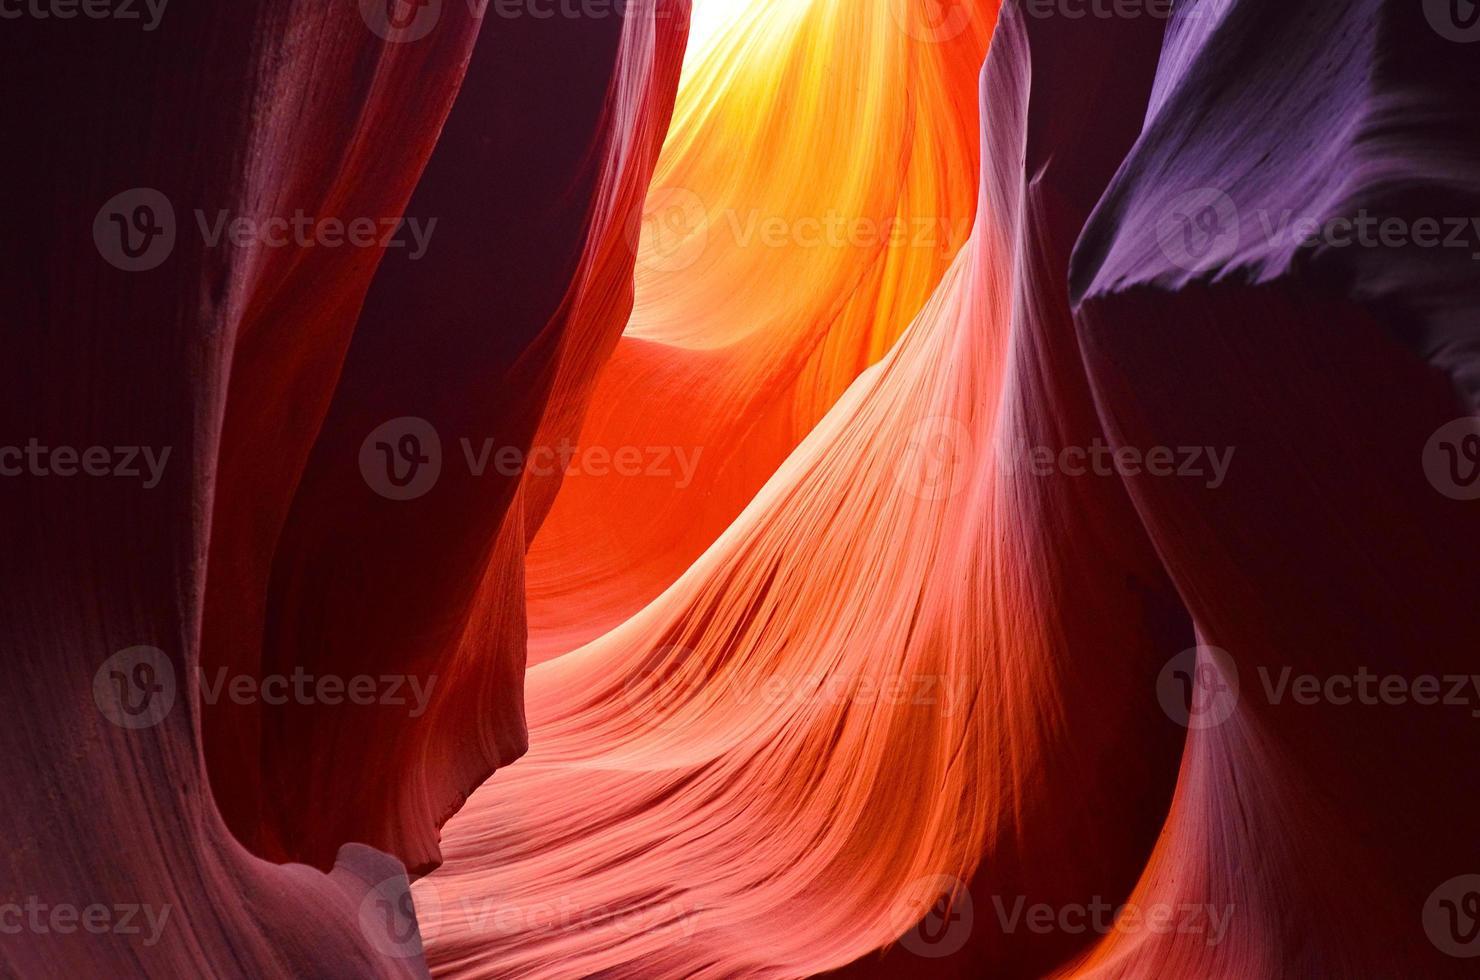 Antelop canyon photo